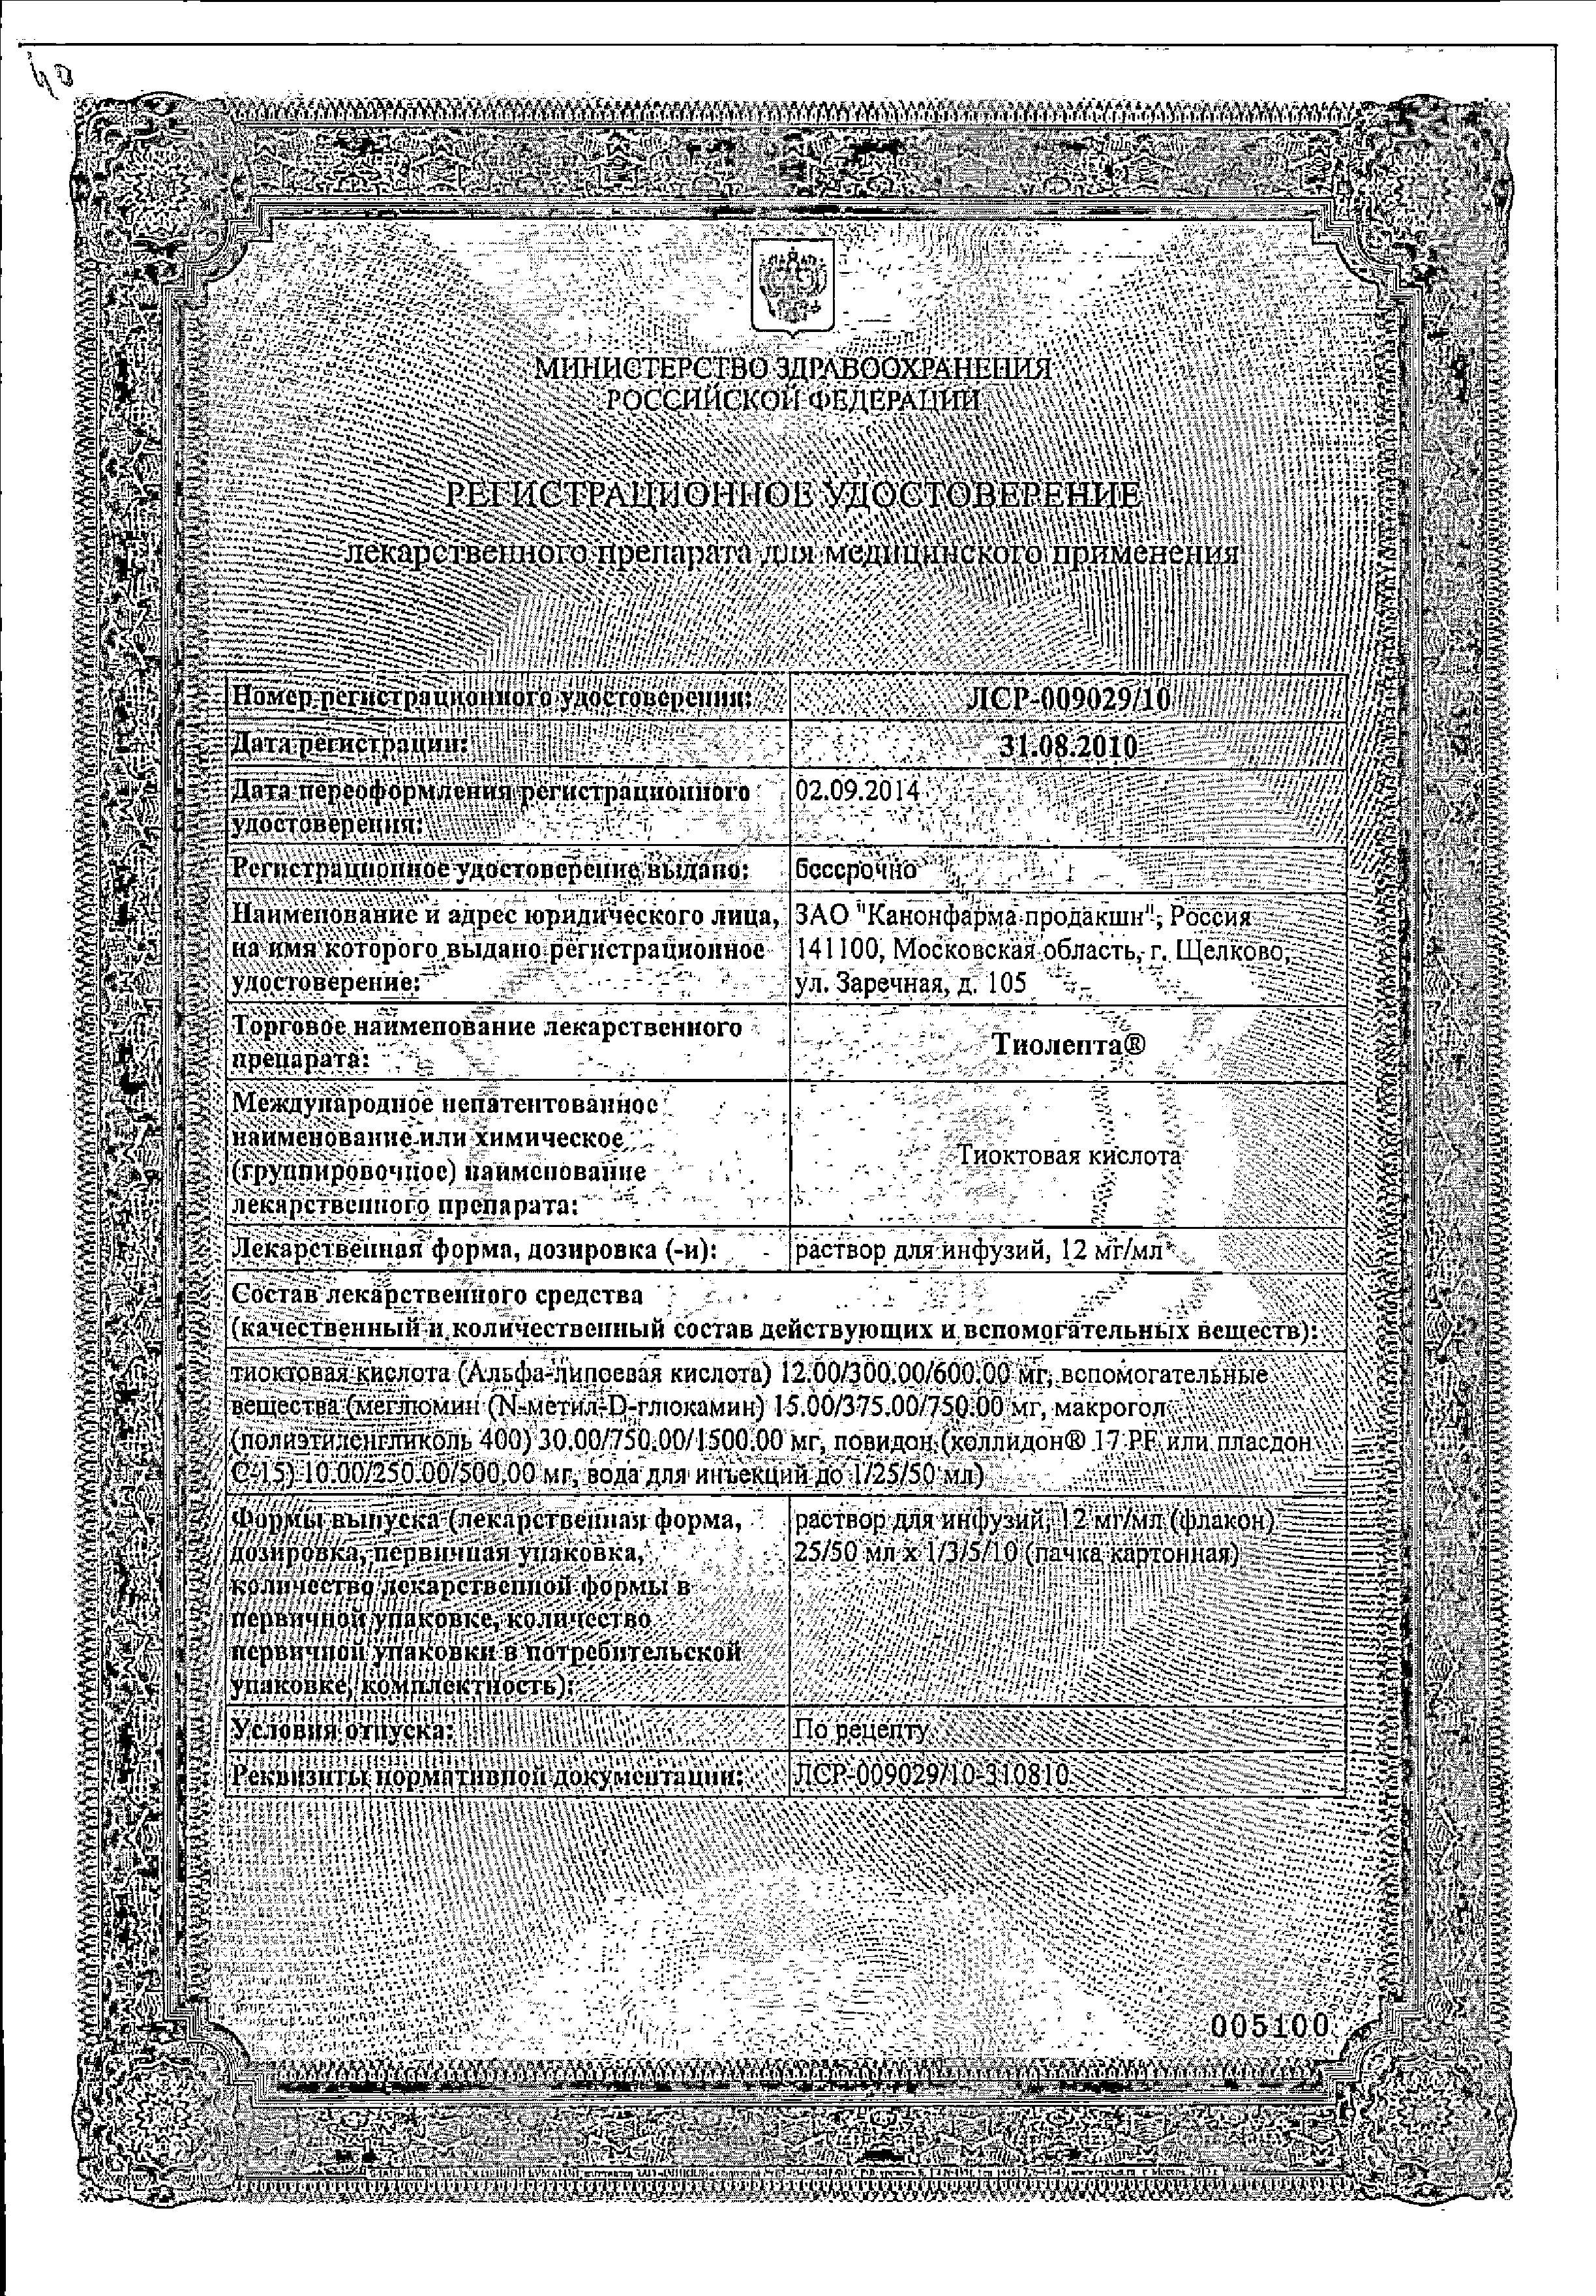 Тиолепта сертификат